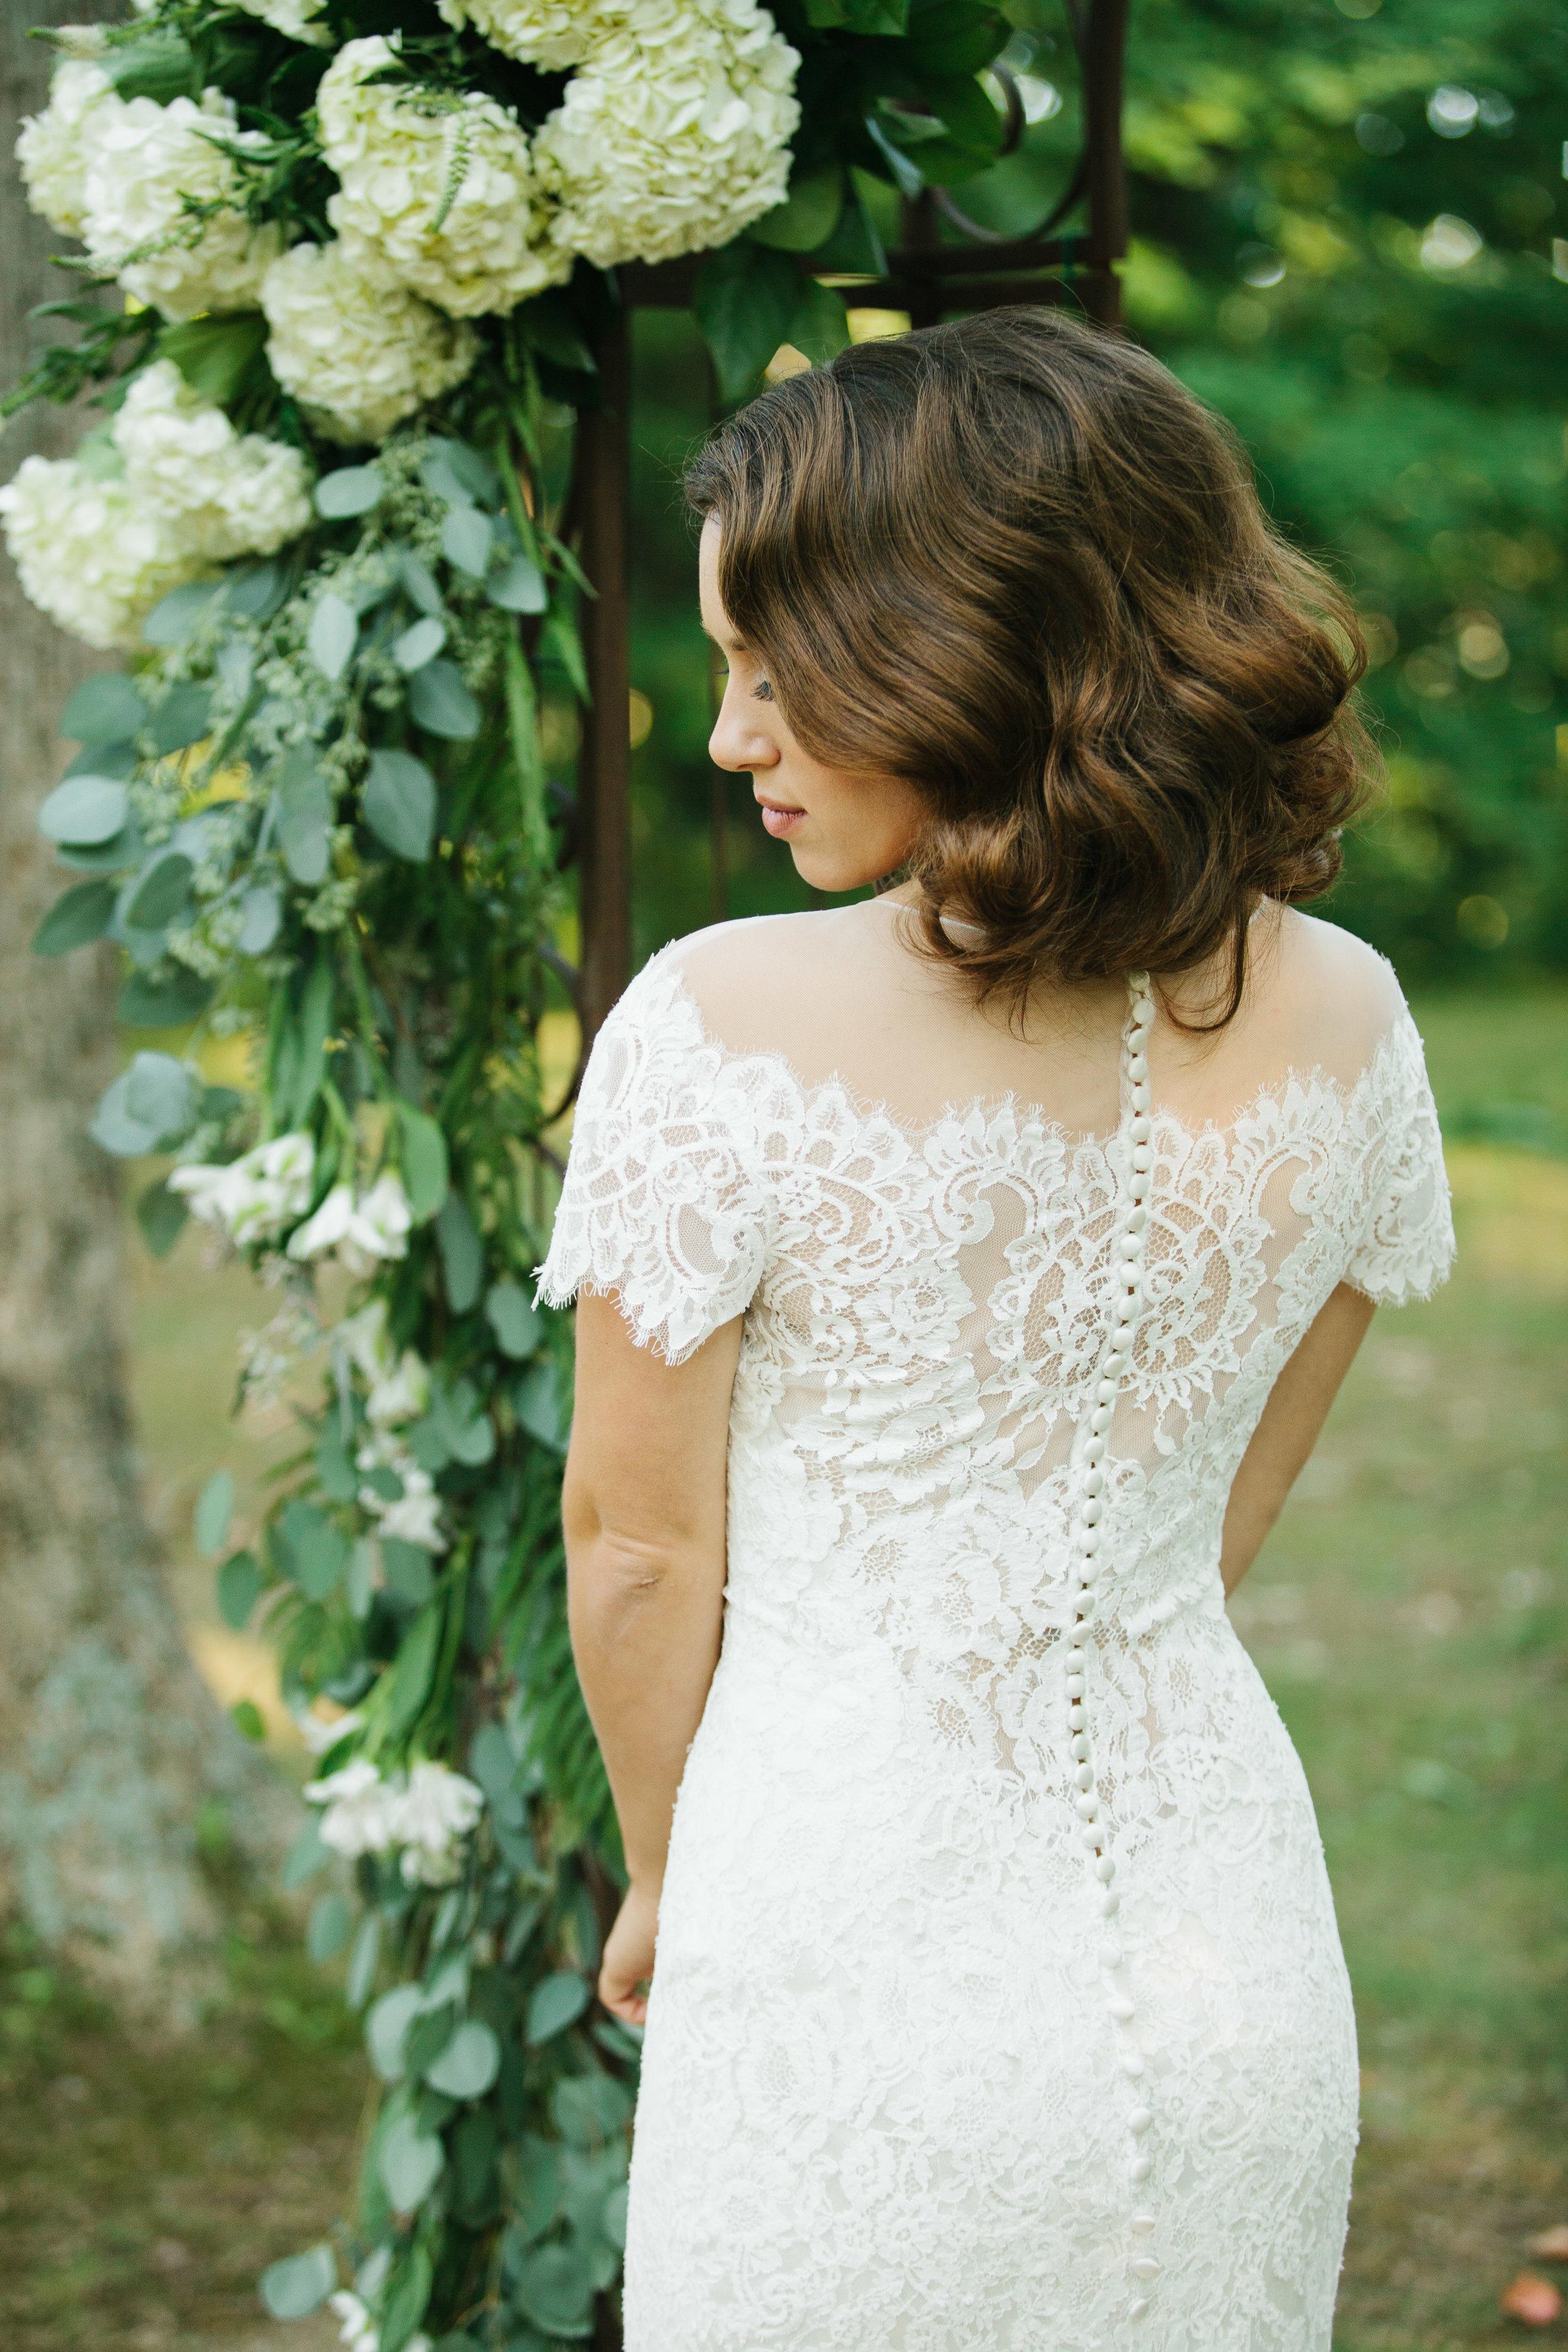 grand_rapids_wedding_rockford_wedding_richard_app_gallery_wedding_grand_rapids_wedding_photographer_summer_wedding_wabasis_lake_park_wedding_rustic_wedding-52.jpg